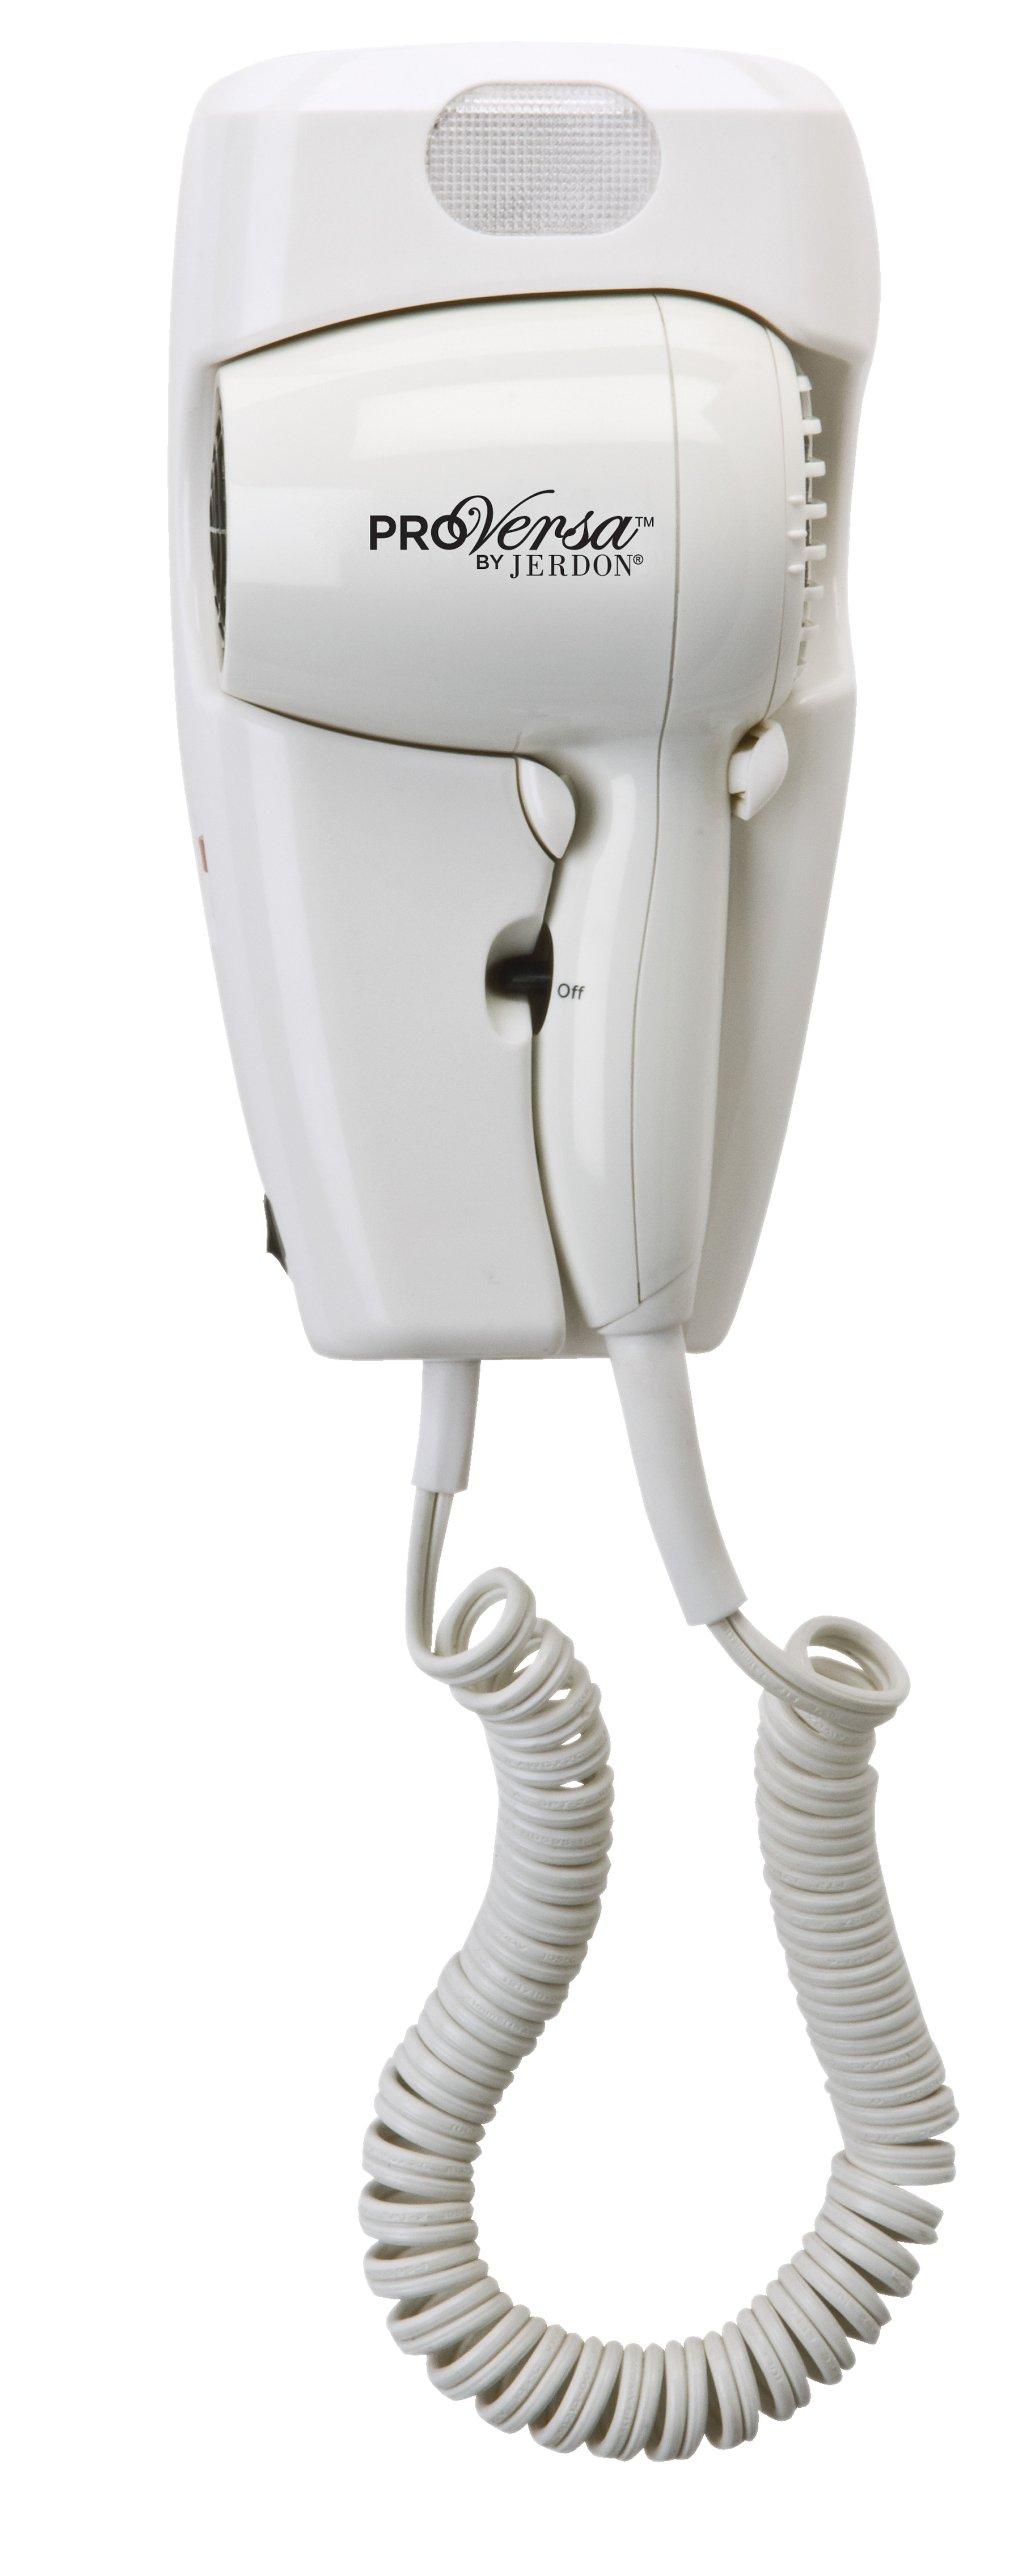 Pro Versa Jwm8cd Hard-Wired Wall Mount Hair Dryer, 1600-Watts, White by VersaPro